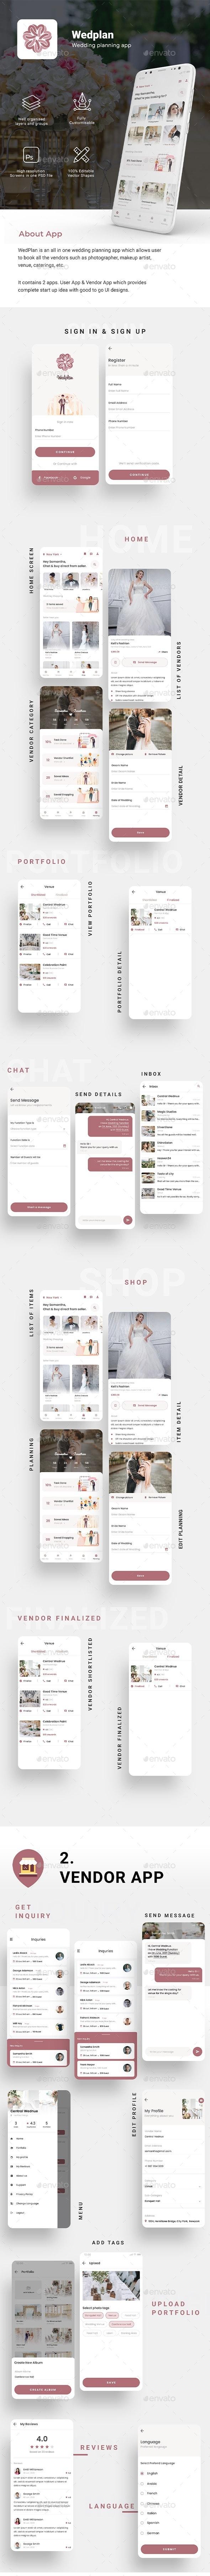 Wedding Planner | Event Management App UI | WedPlan - User Interfaces Web Elements